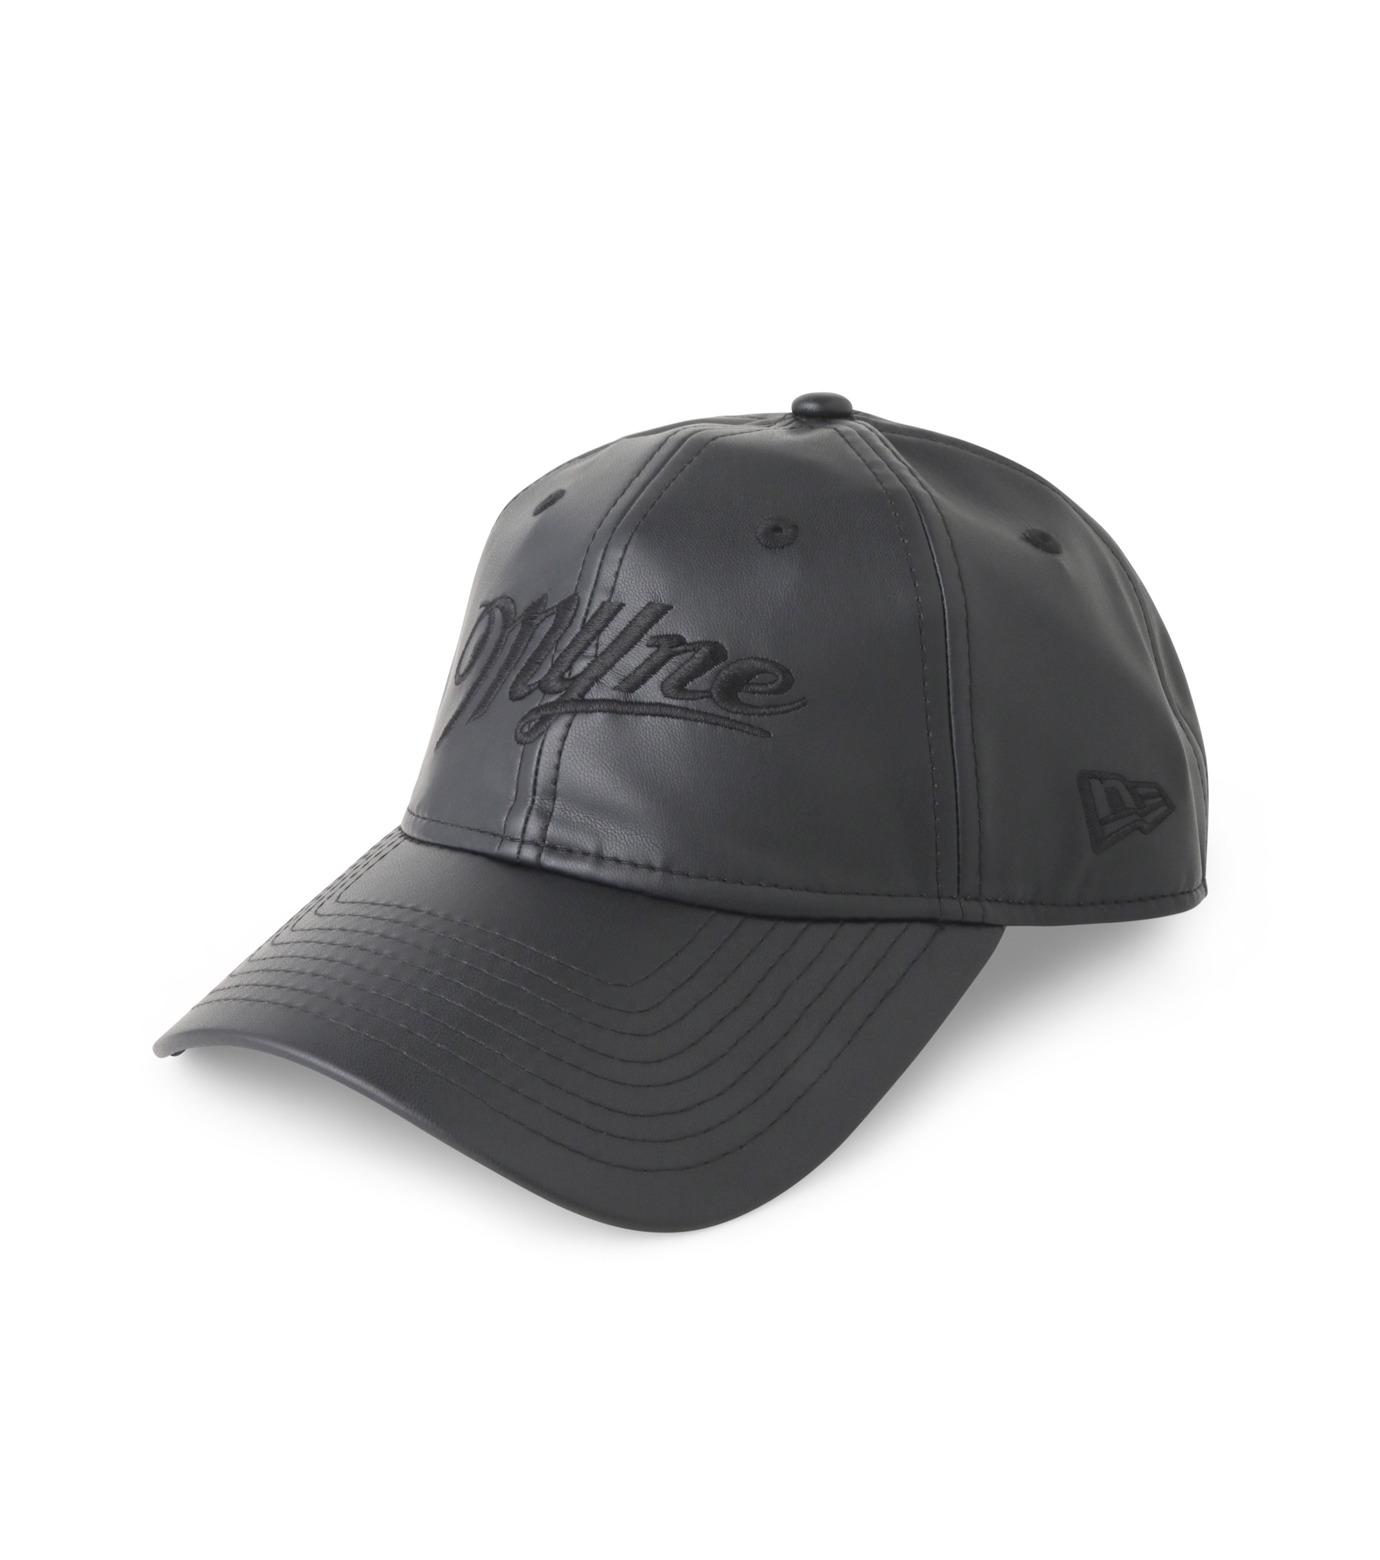 MYne(マイン)の920 Fake Leather Cap-BLACK(キャップ/cap)-MYA8-0004-13 拡大詳細画像1